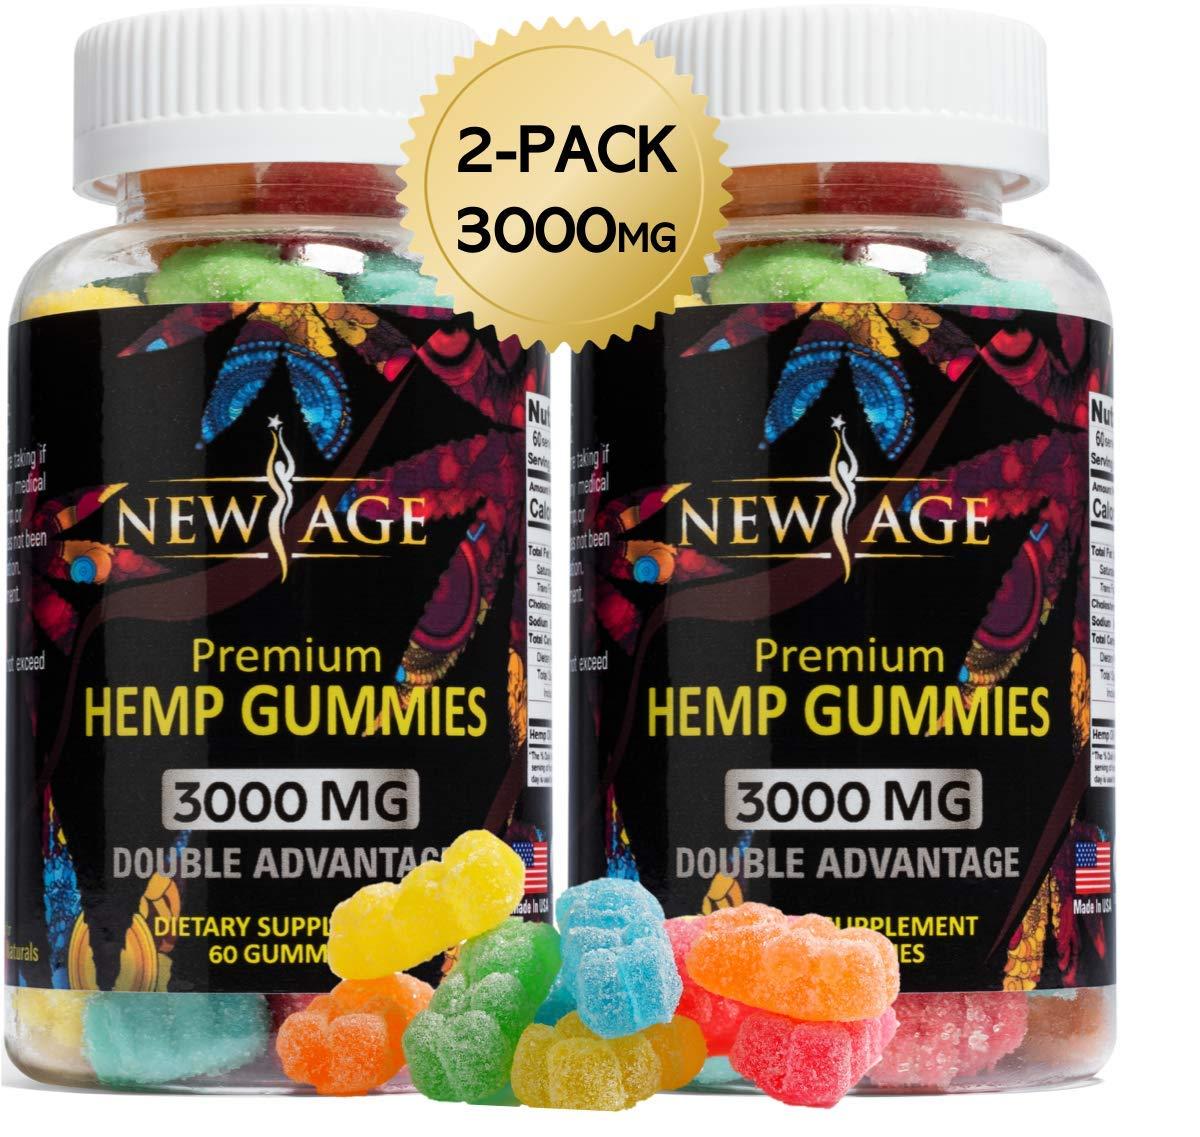 (2 Pack) New Age Naturals Advanced Hemp Big Gummies 3000mg 120ct - 100% Natural Hemp Oil Infused Gummies by New Age